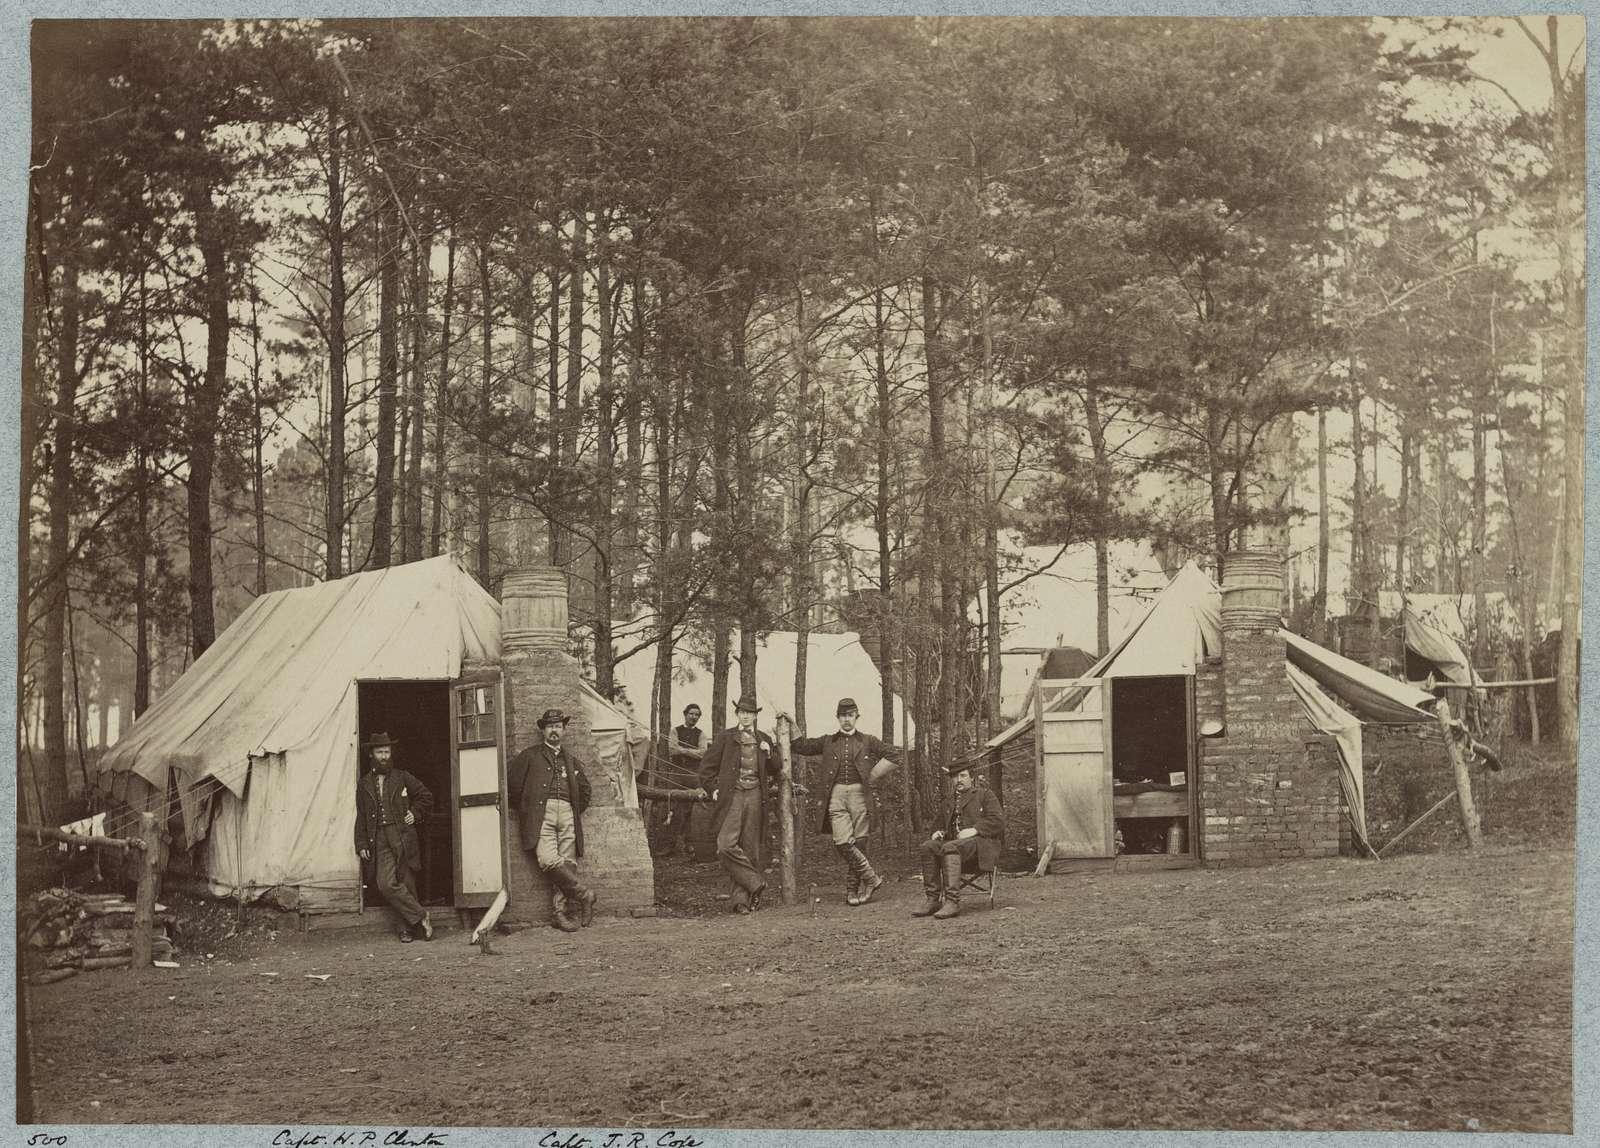 Headquarters Army of Potomac - Brandy Station, Va. April 1864. Quarters of Provost Marshal Department. Capt. H. P. Clinton. Capt. J. R. Coxe